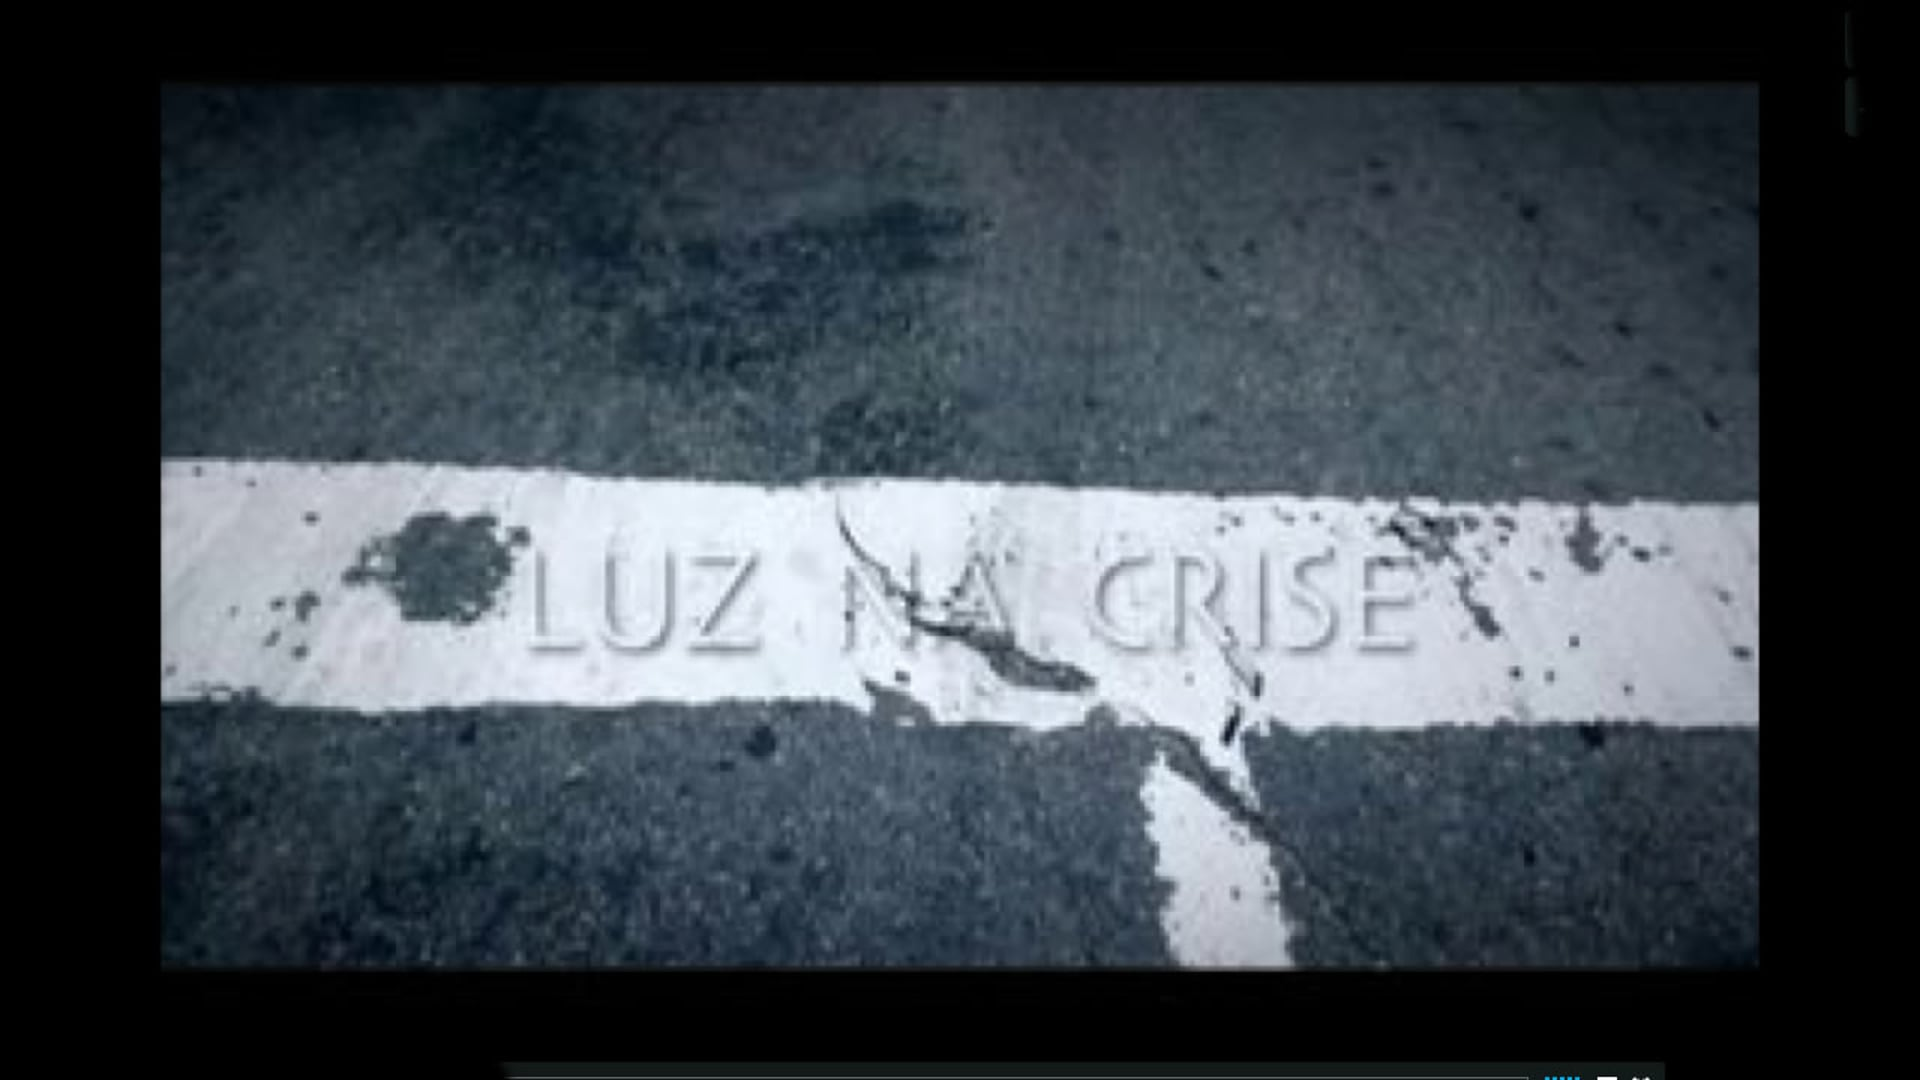 LUZ NA CRISE